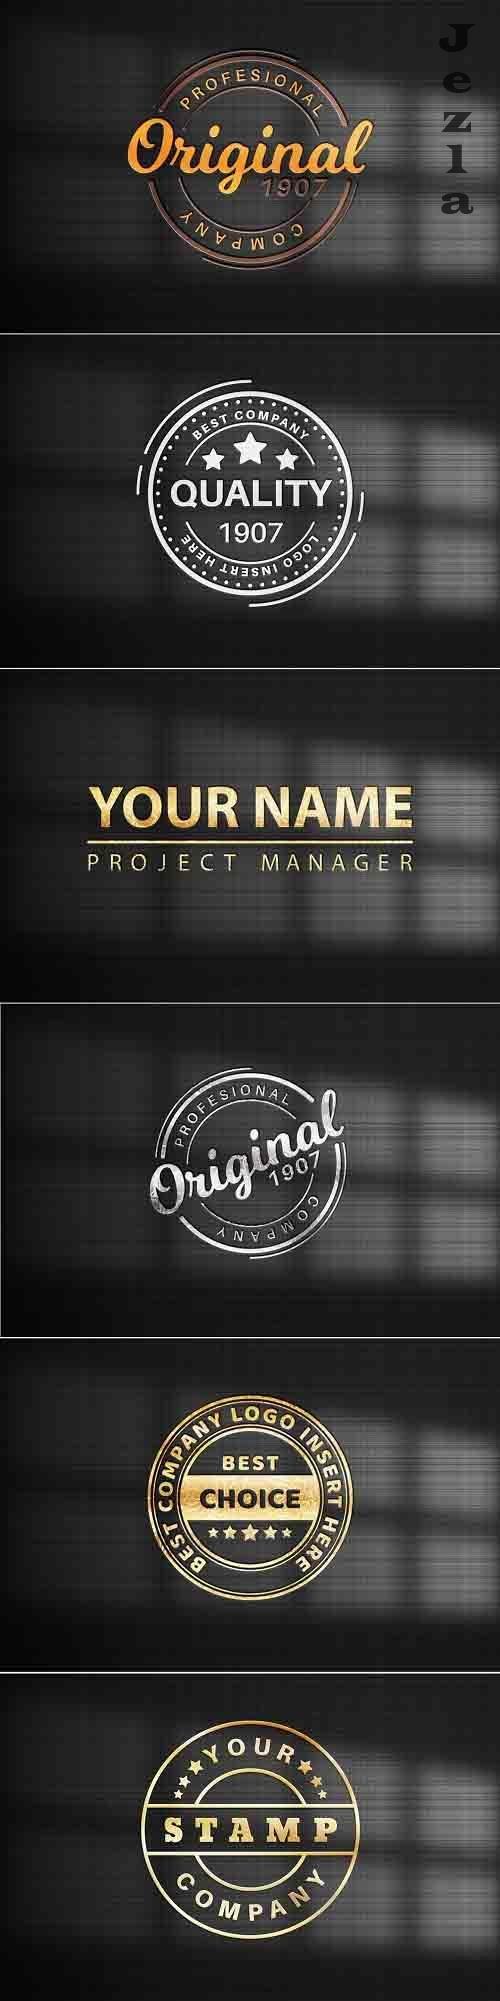 Logo on black paper- mockup template - 6173191